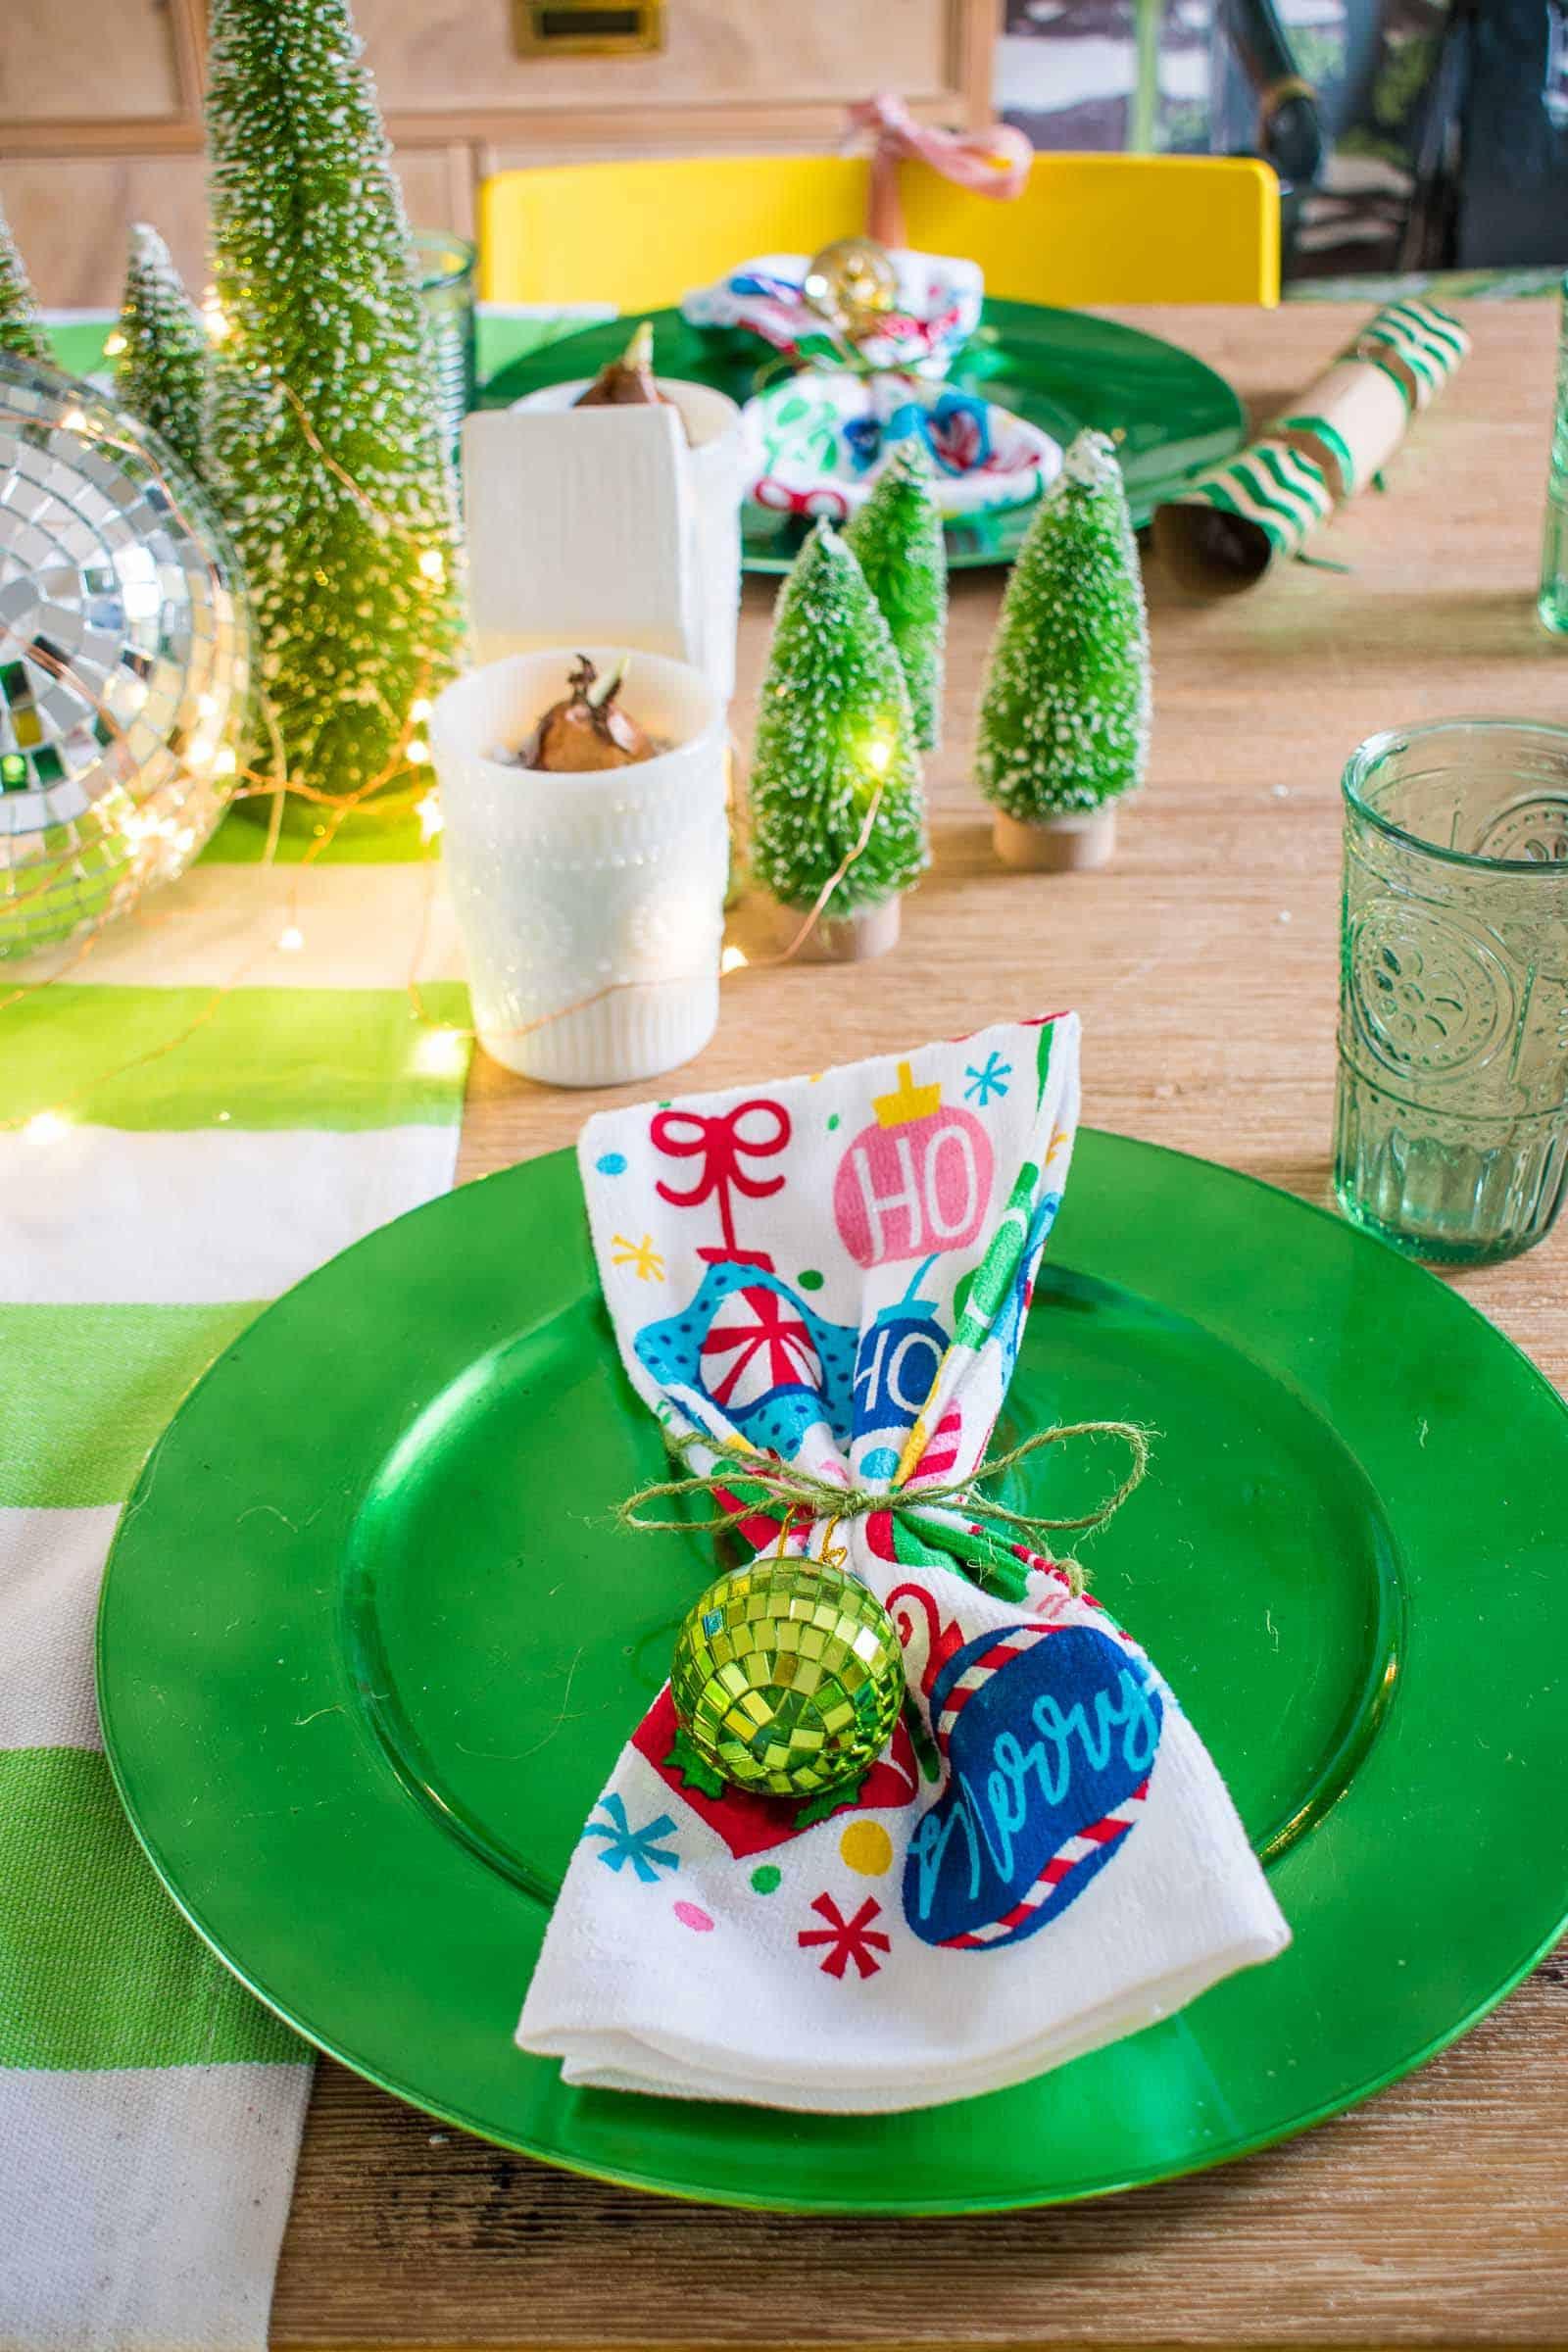 christmas dishtowel at table setting